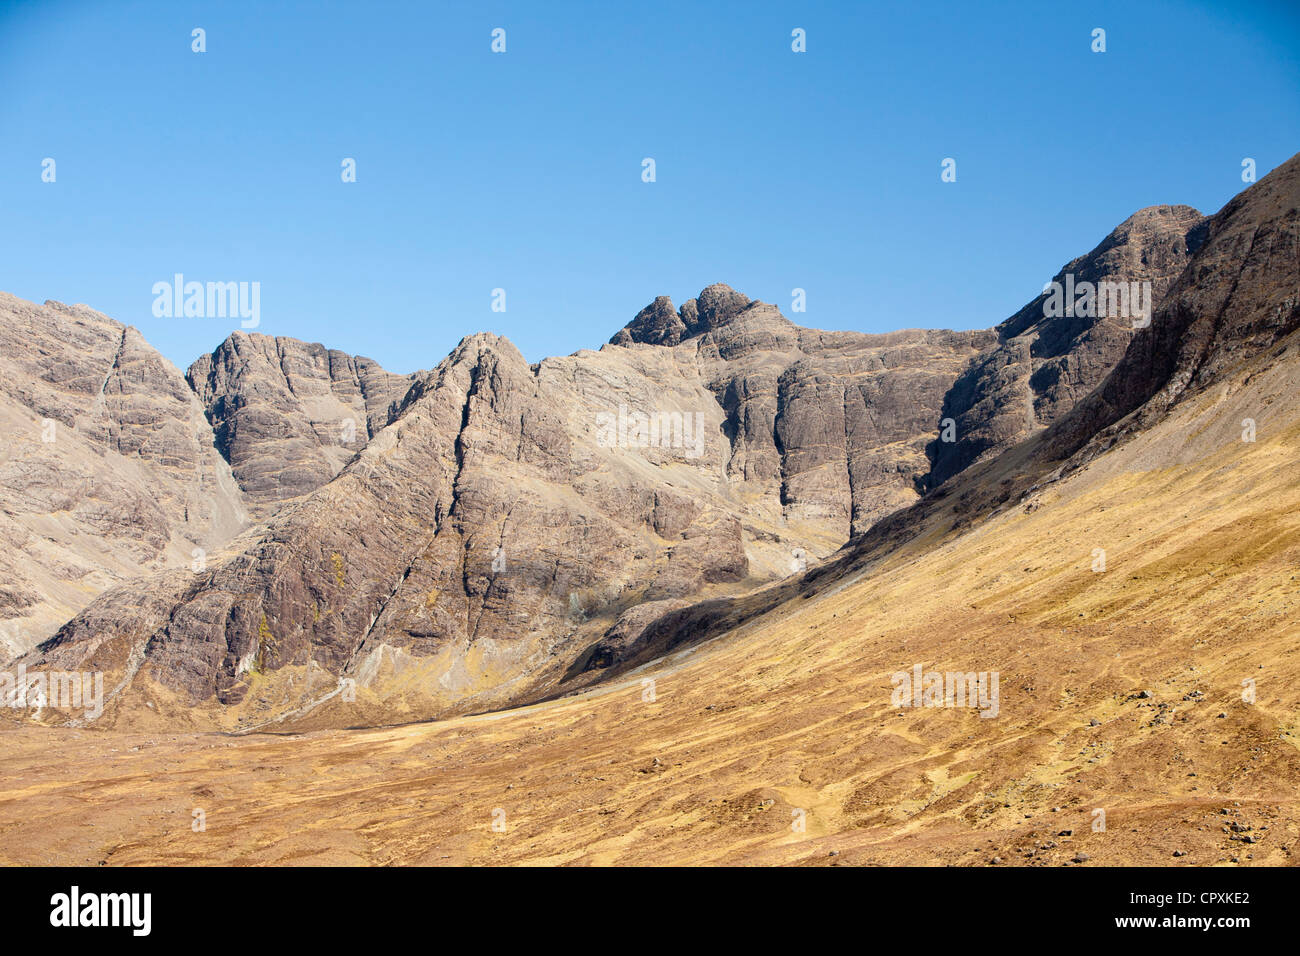 Waterpipe gully on Sgurr an Fheadain on the Cuillin Ridge, Isle of Skye, Scotland, UK. - Stock Image